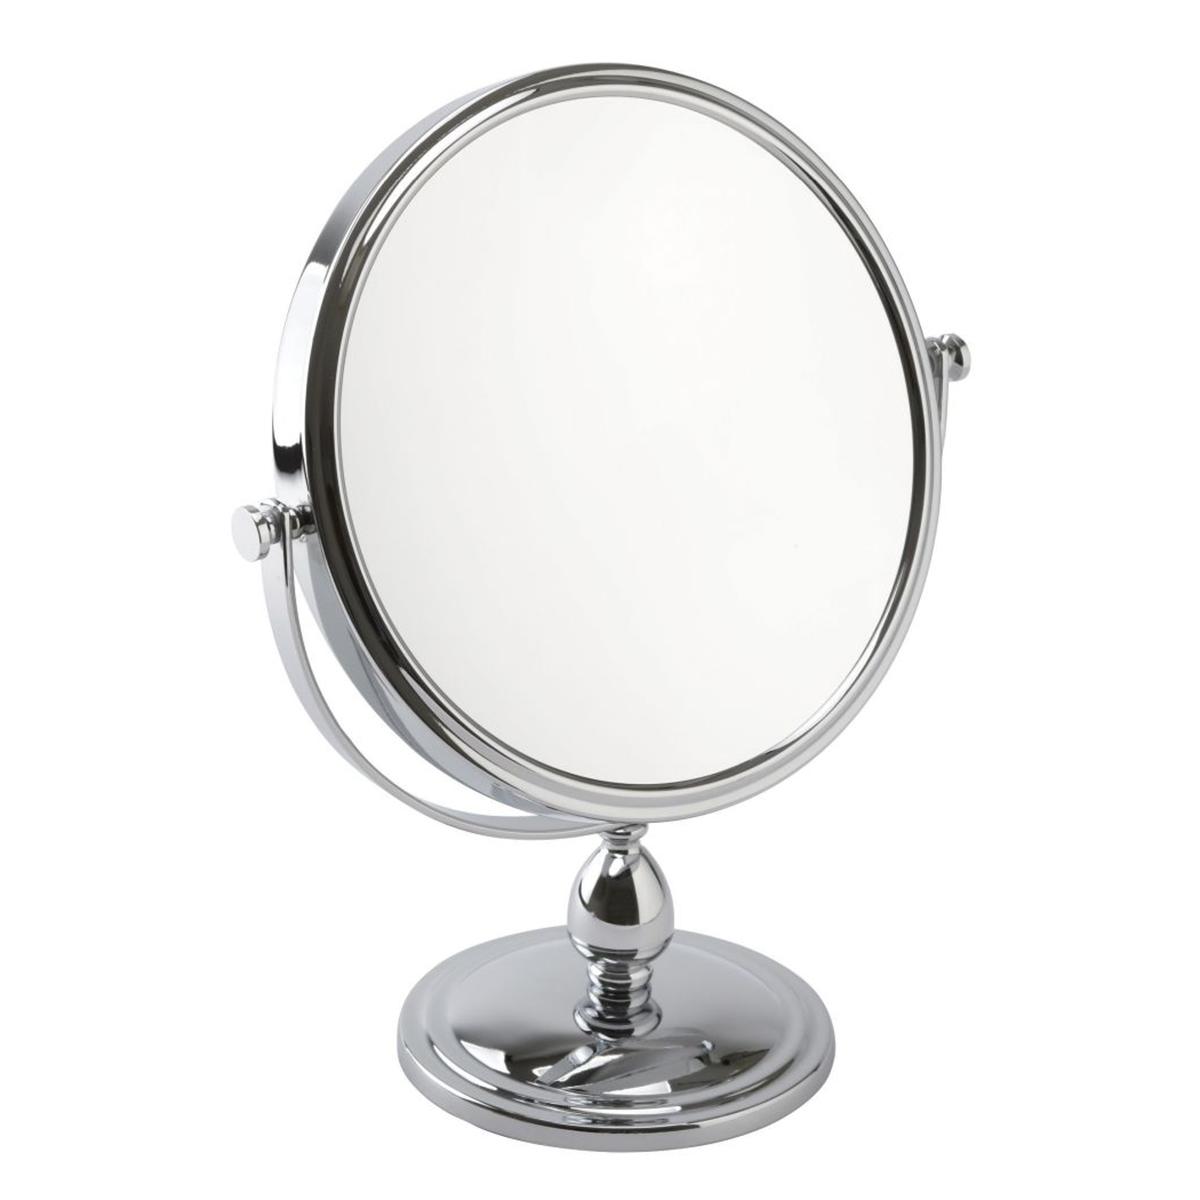 10x Magnification Pedestal Mirror in Chrome